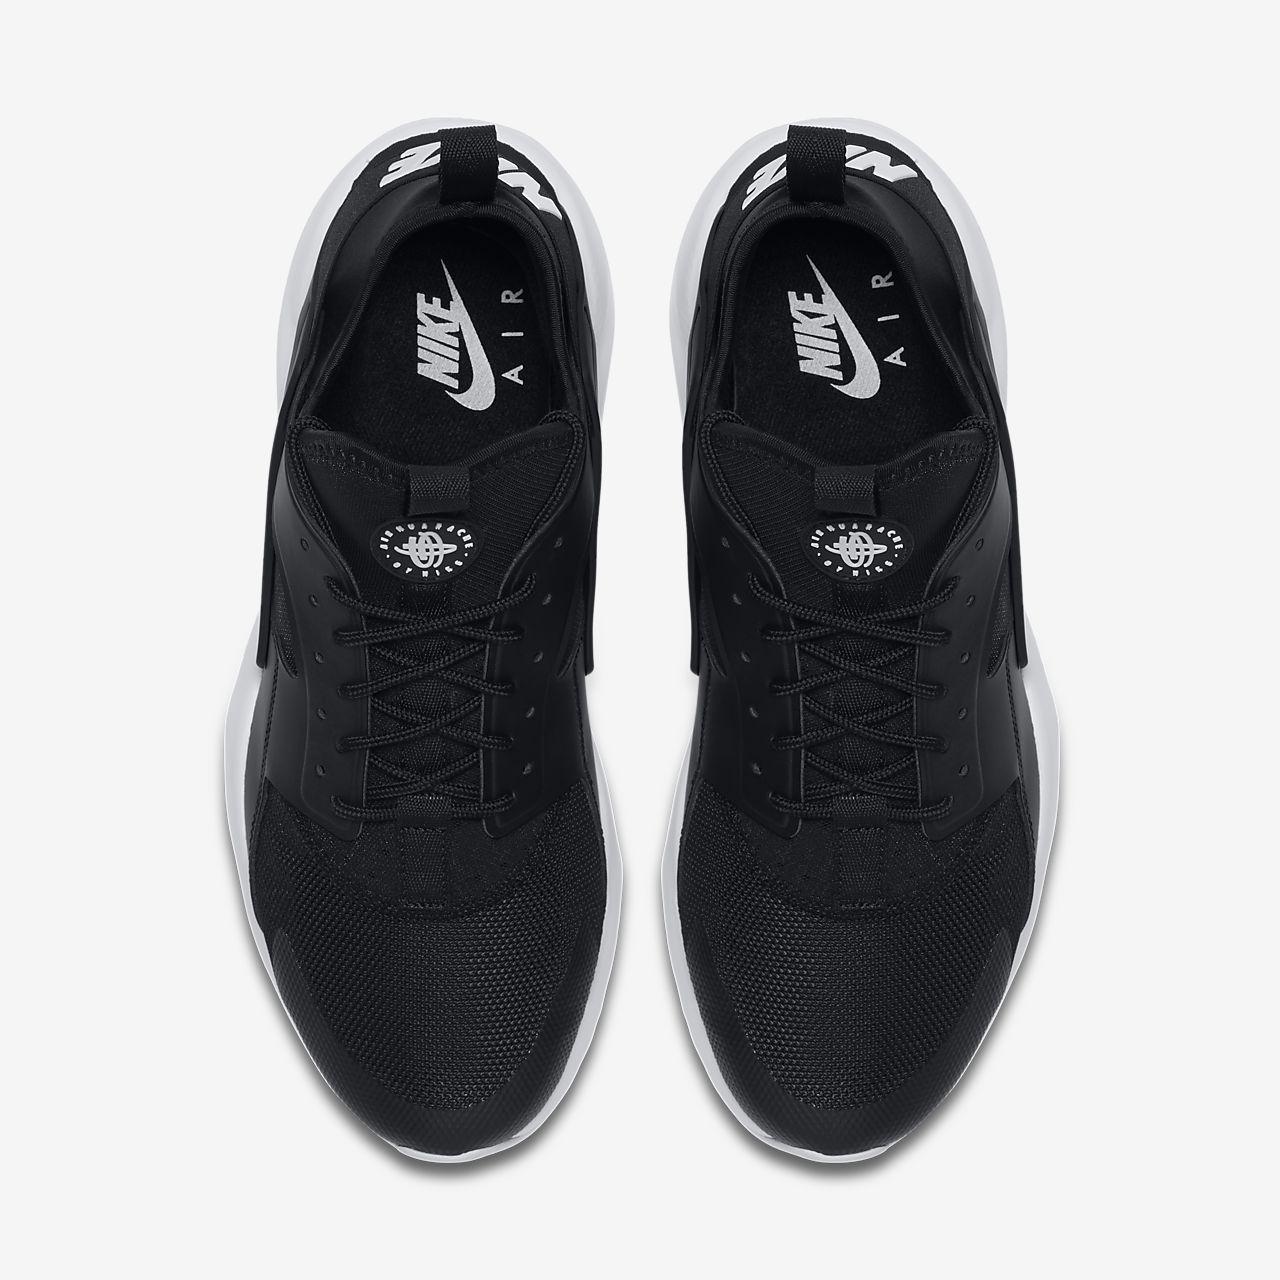 8a586585d844 Nike Air Huarache Ultra Men s Shoe. Nike.com GB